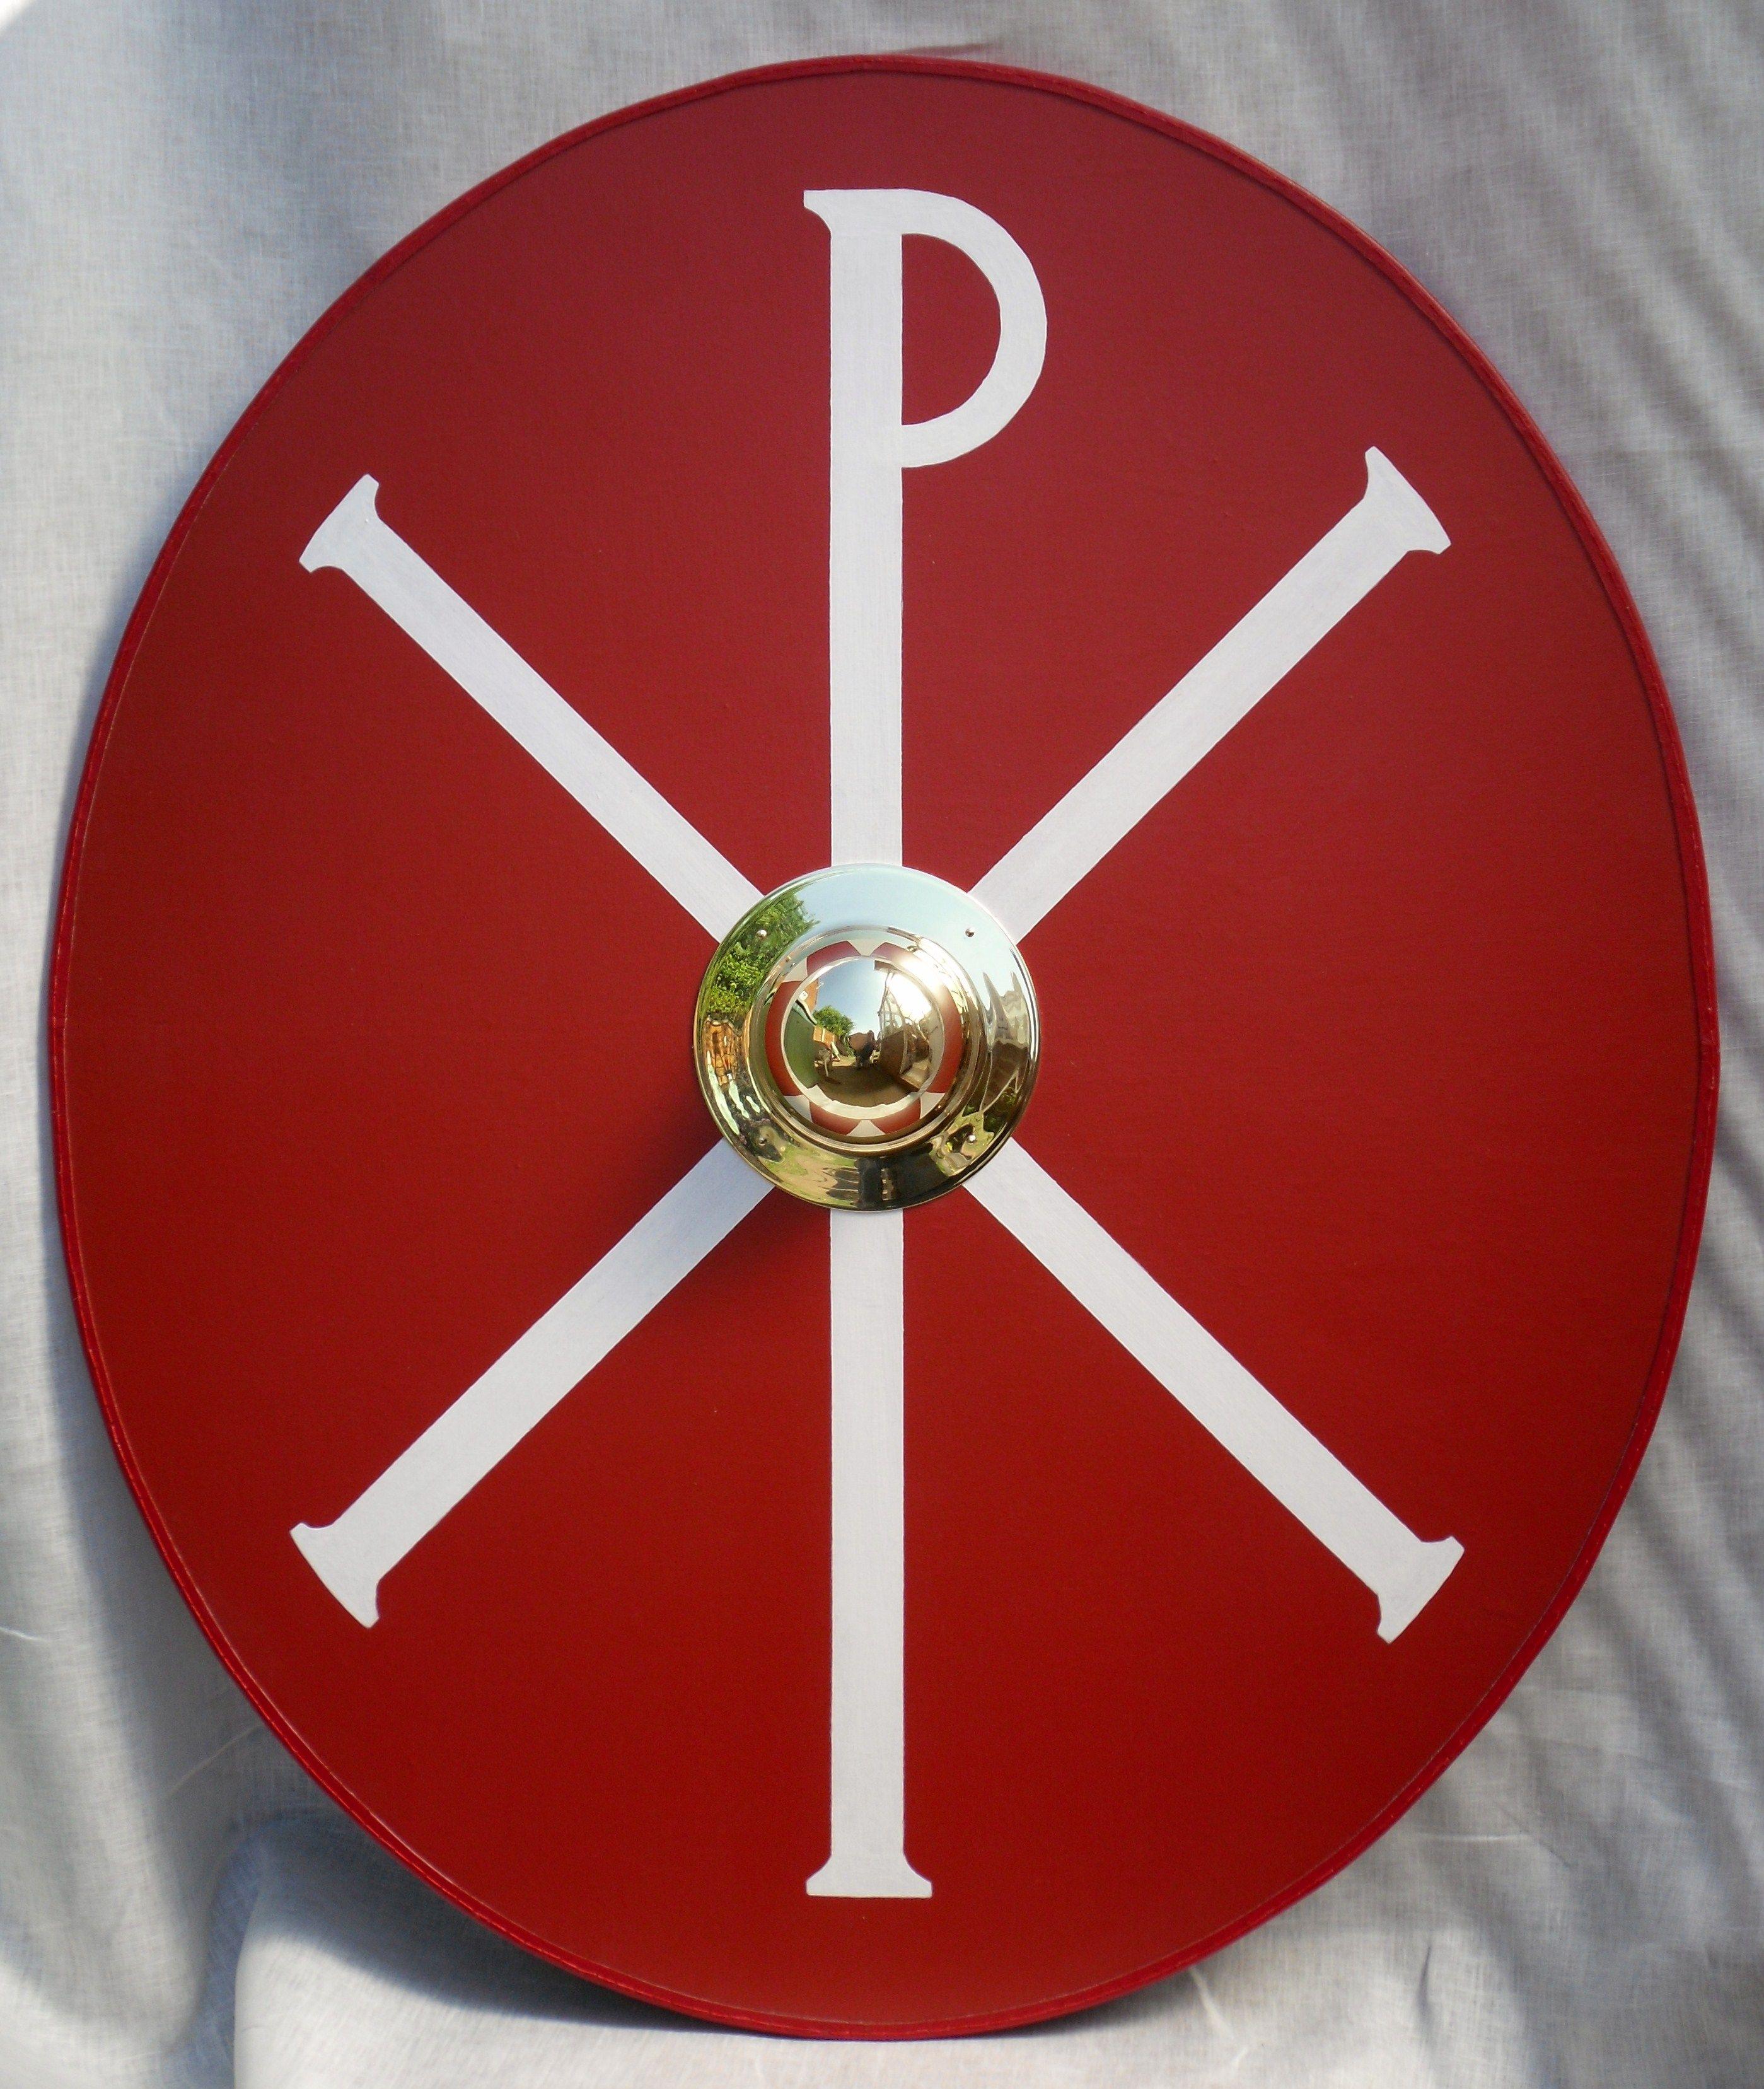 Equipment: Shields and Swords | Roman shield, Eastern roman, Roman soldiers